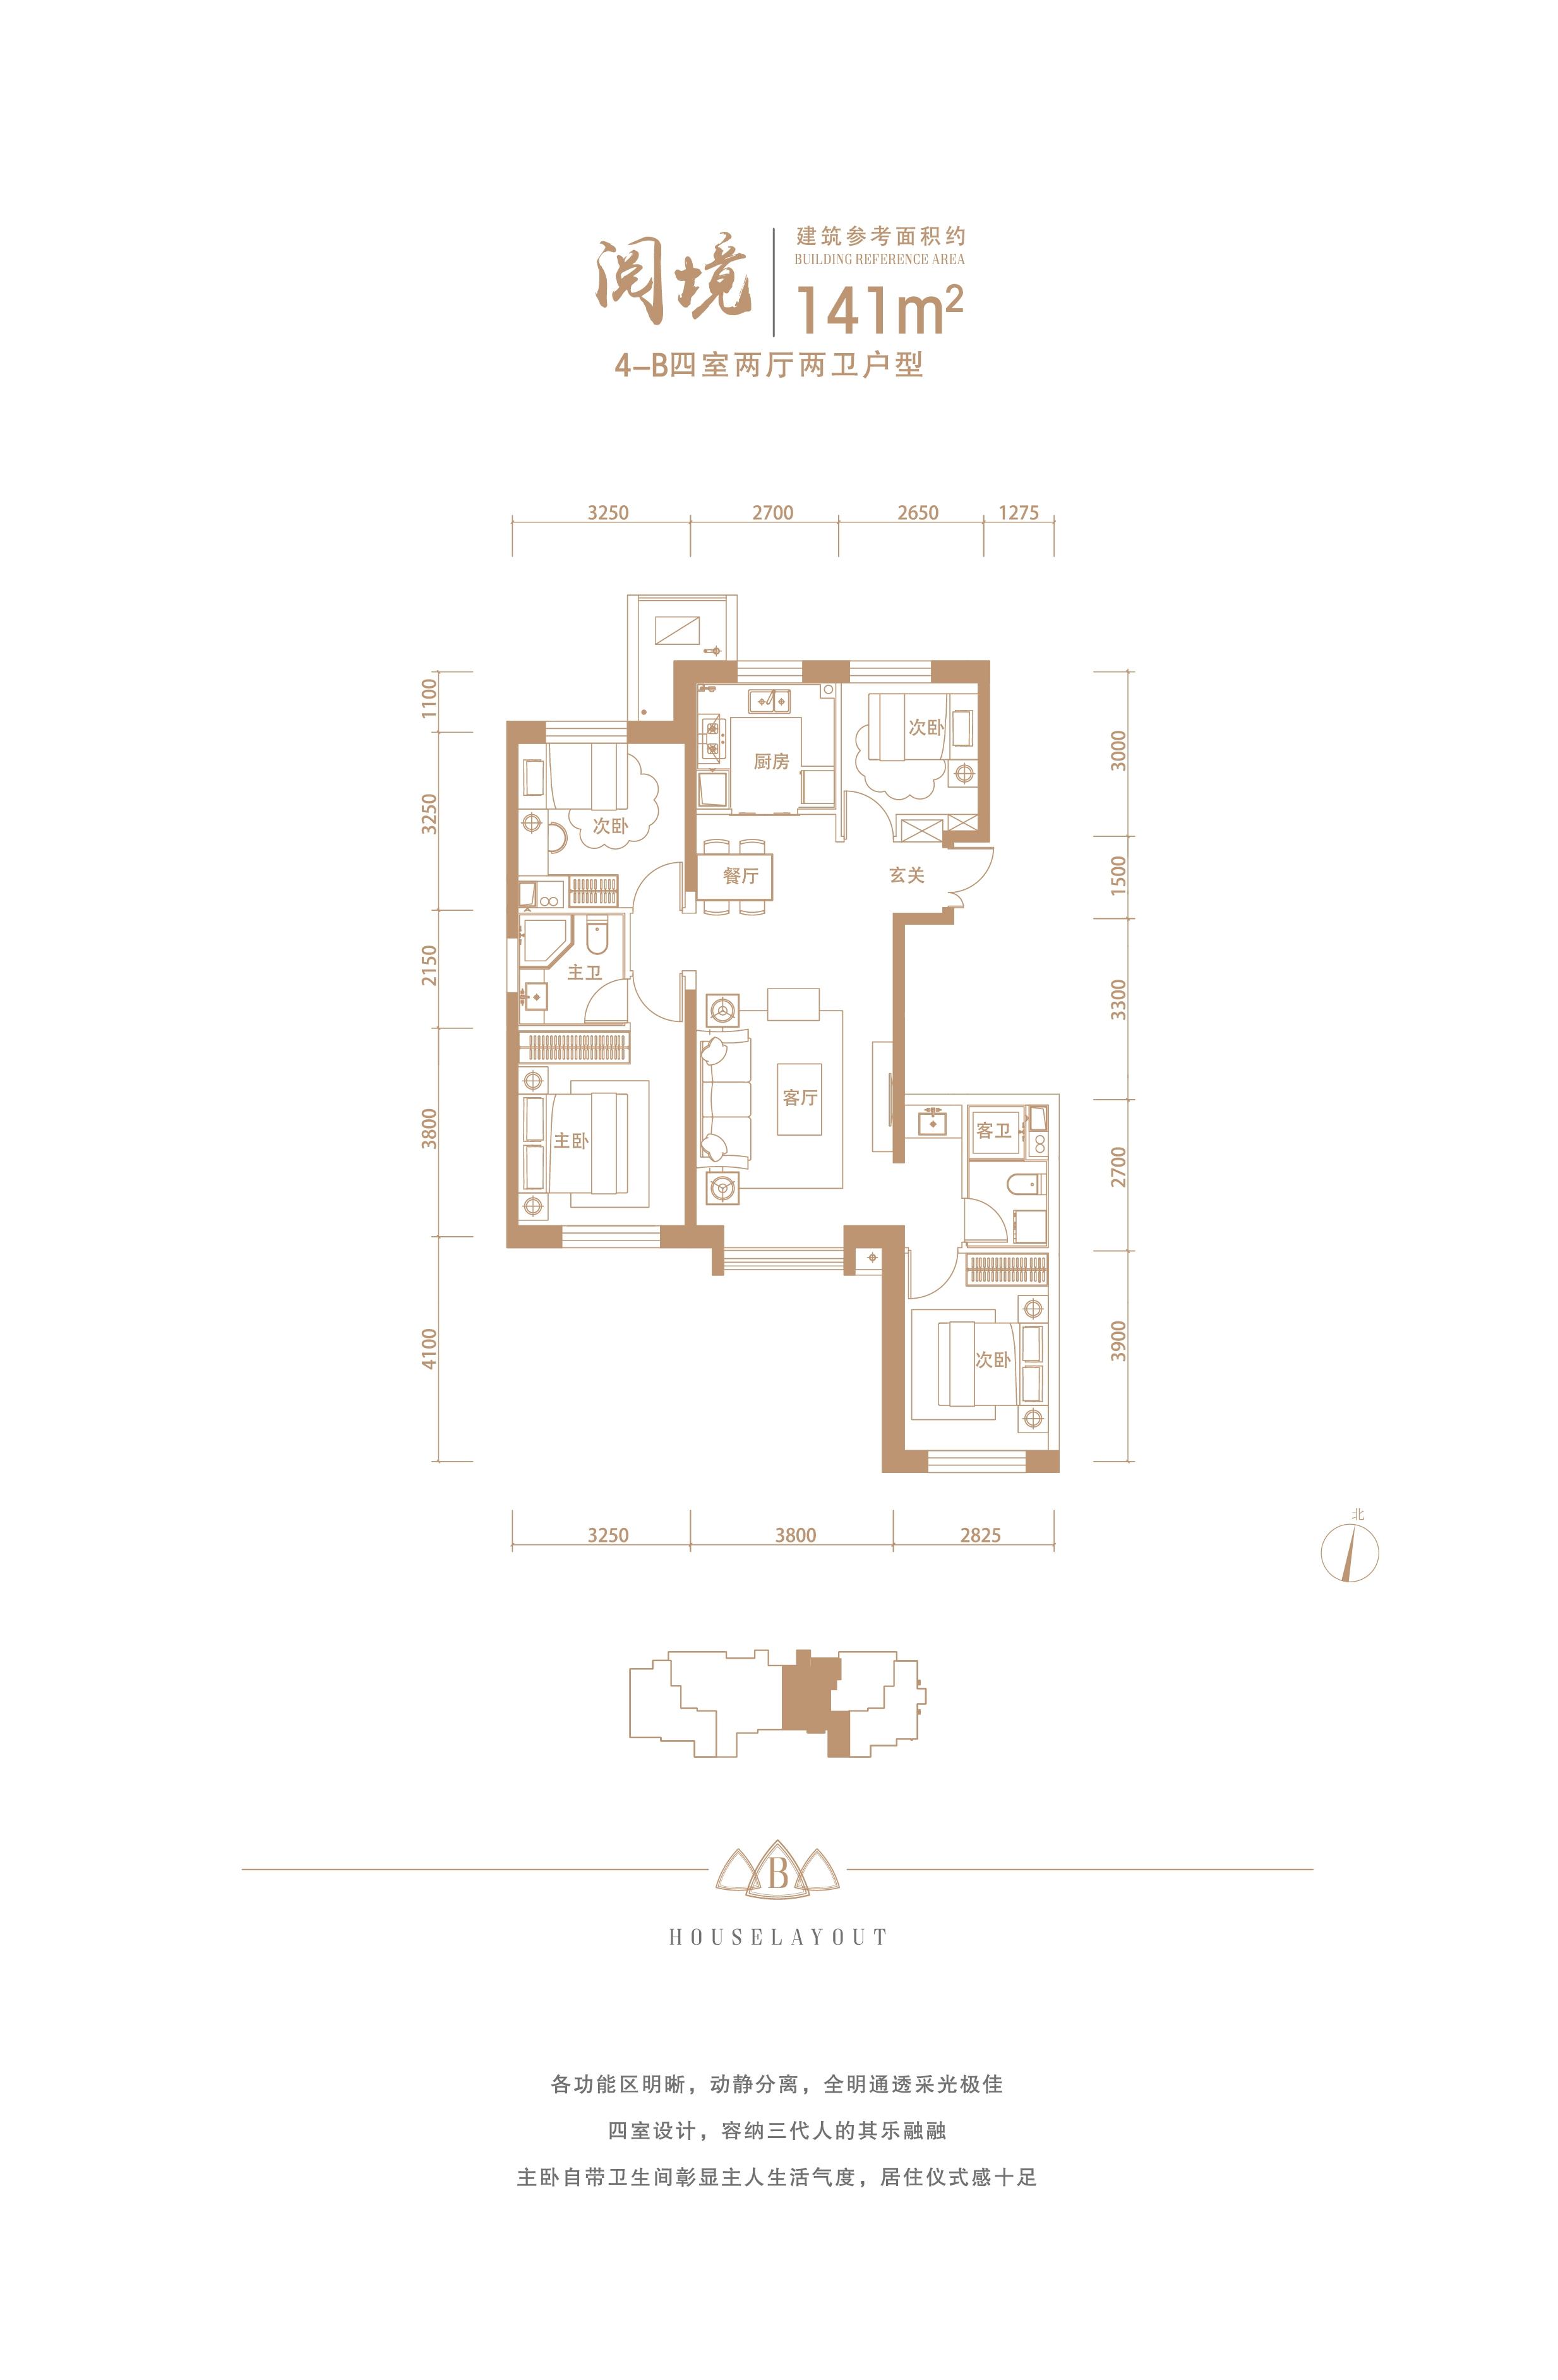 4-B户型141平米 四室两厅两卫